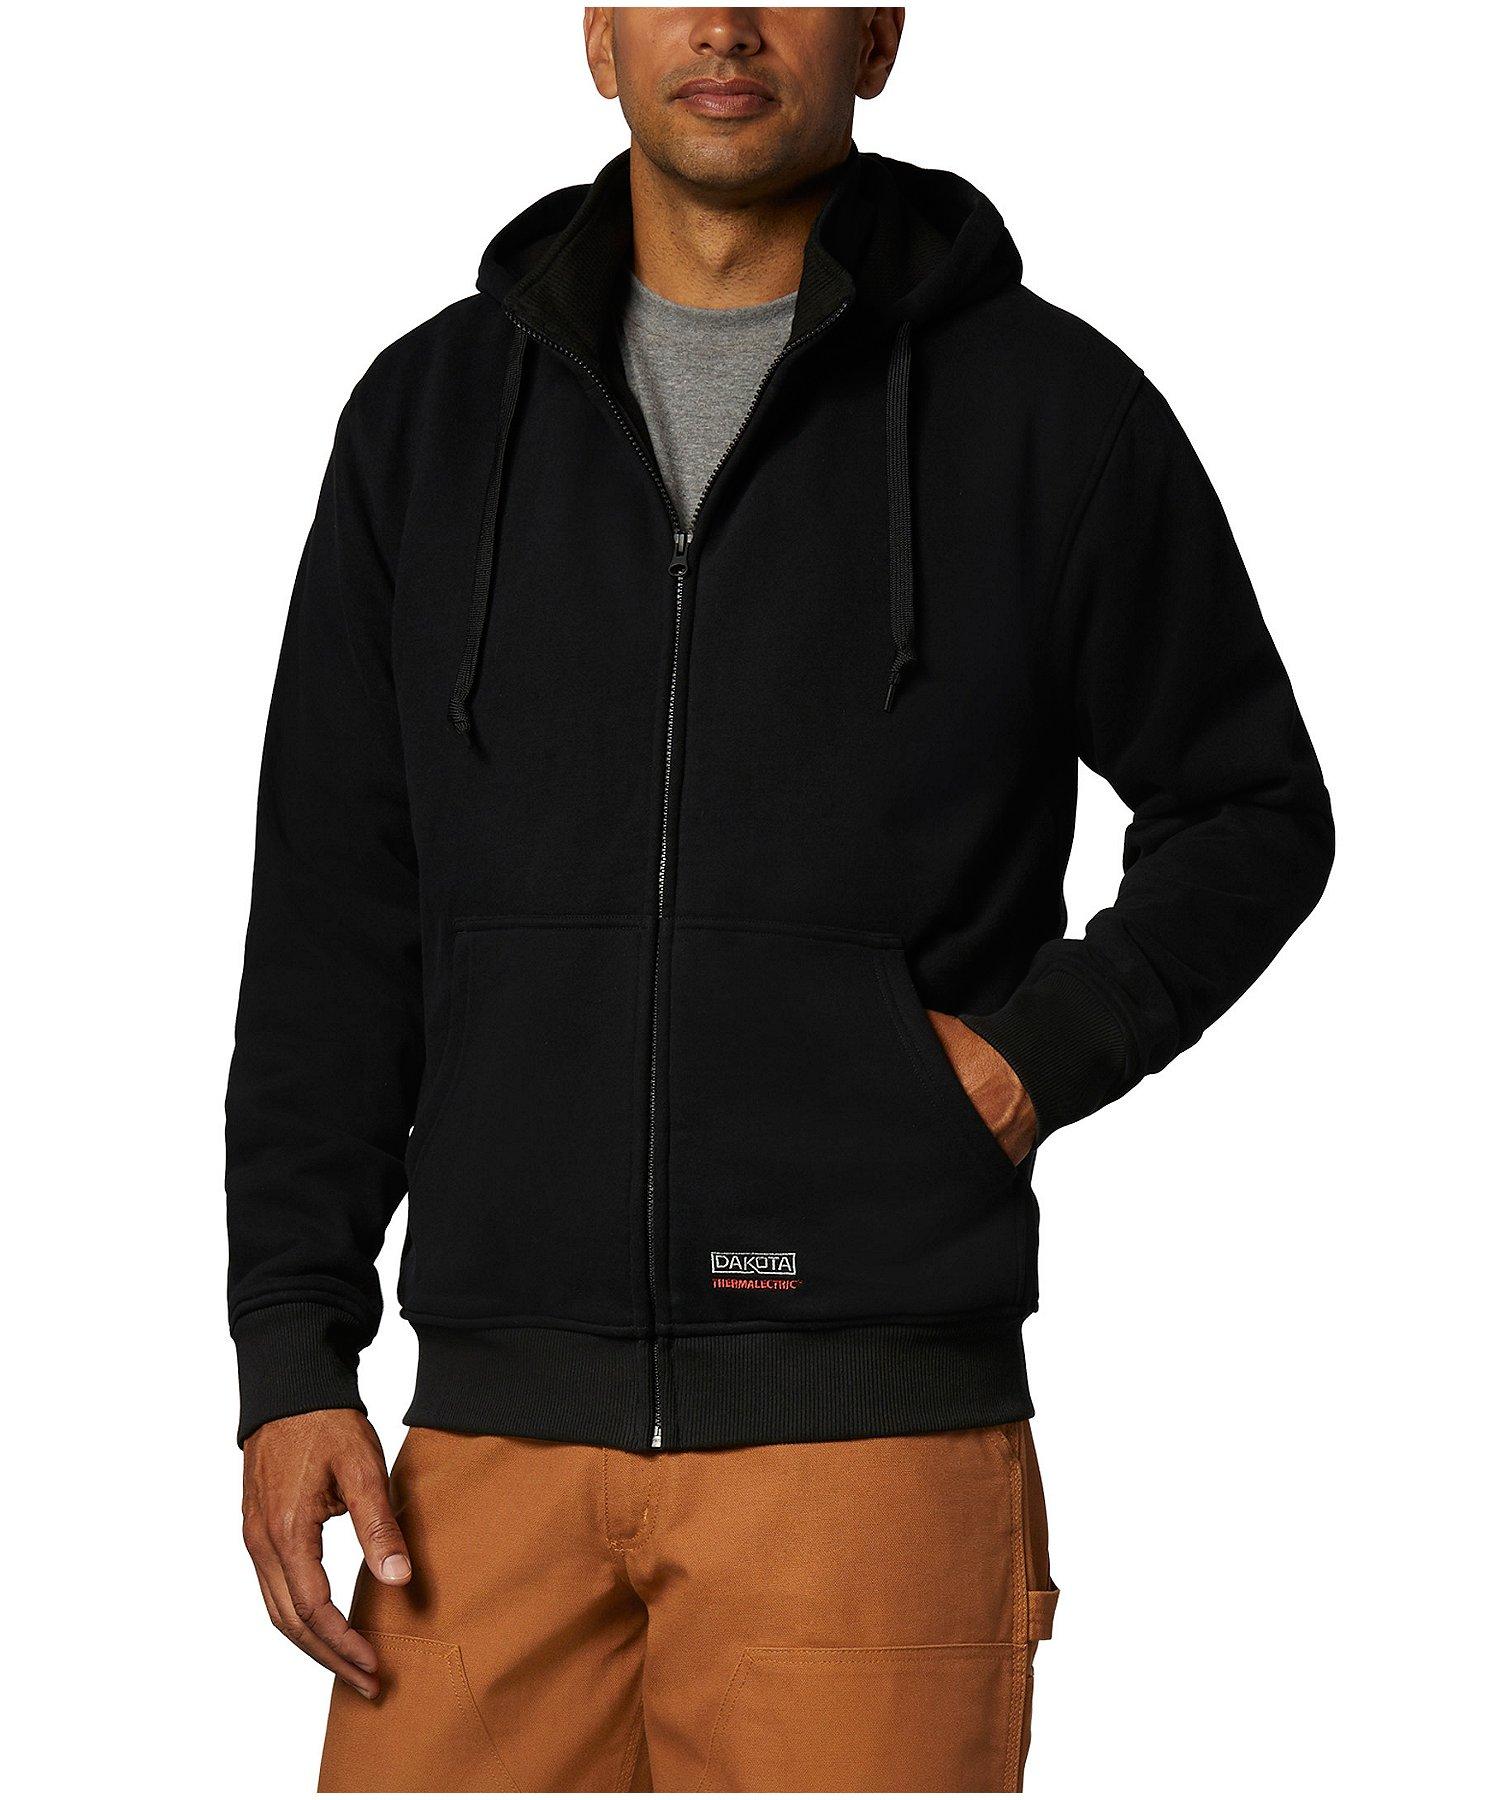 new Women Loose Pullover Thermal Fur Lined Basic Sweatshirt Hoodie coat Tops